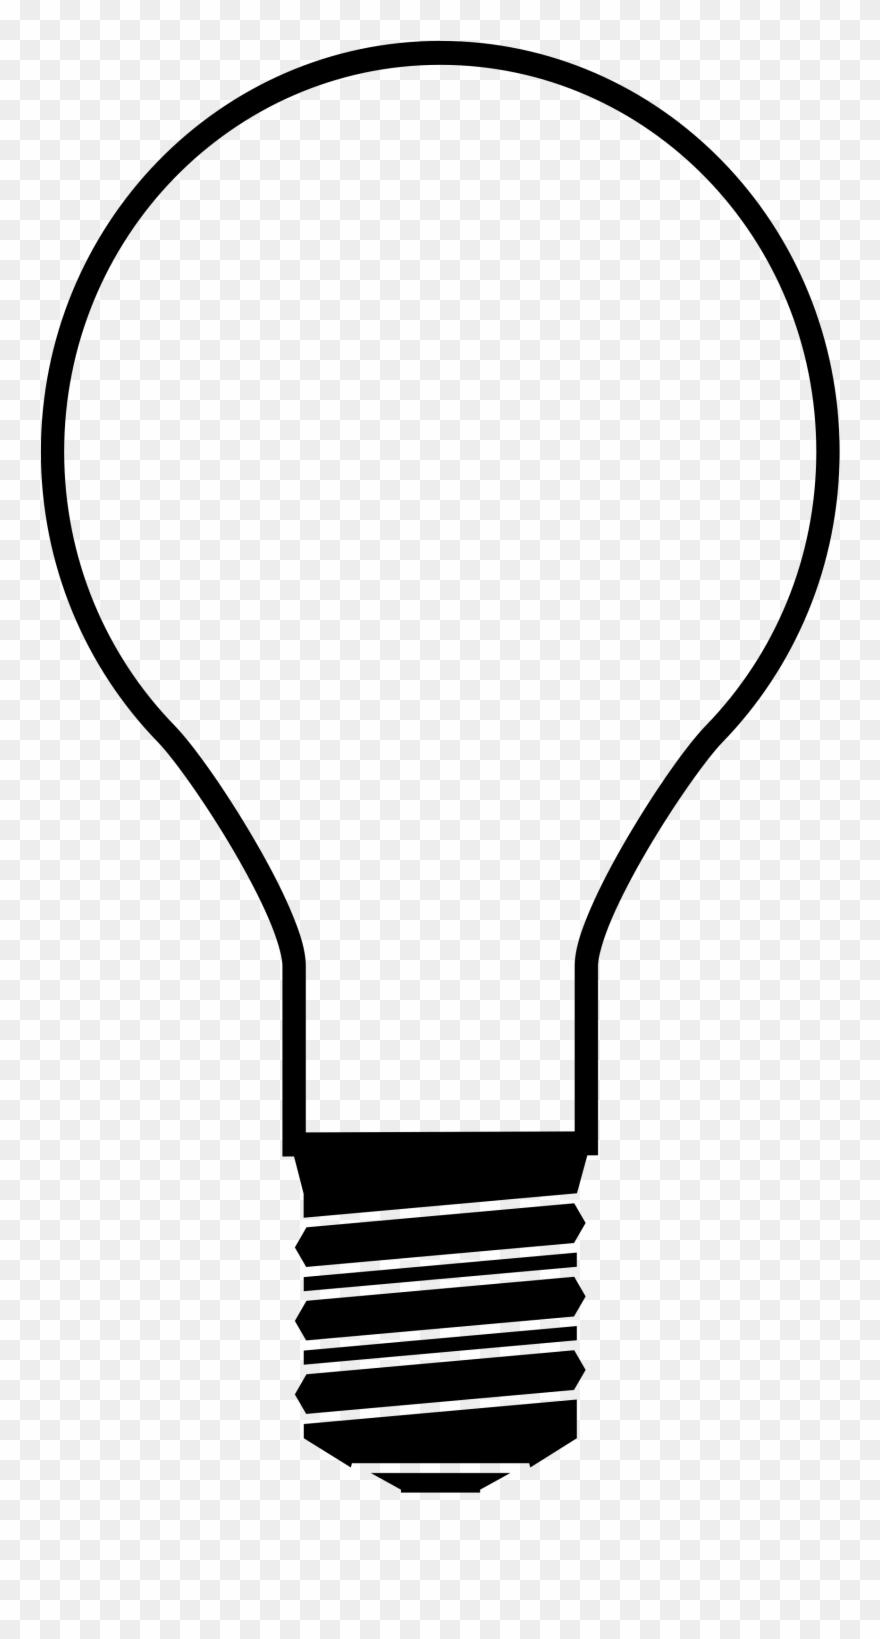 White lightbulb clipart clip royalty free library Christmas Light Bulb Transparent Stock Black And White ... clip royalty free library